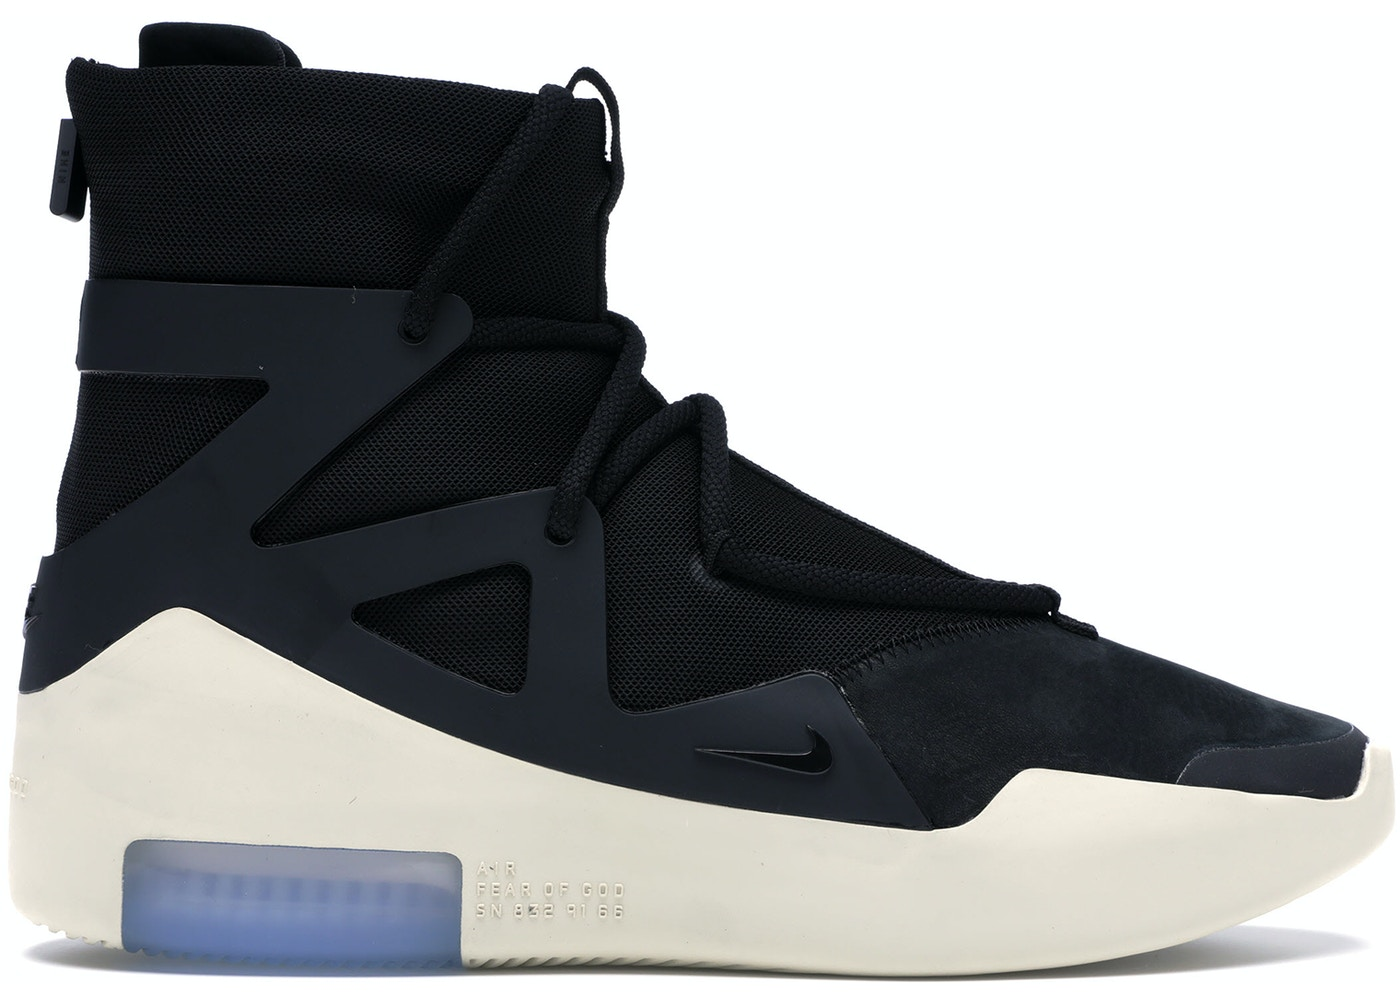 5562493f3a Buy Nike Shoes   Deadstock Sneakers